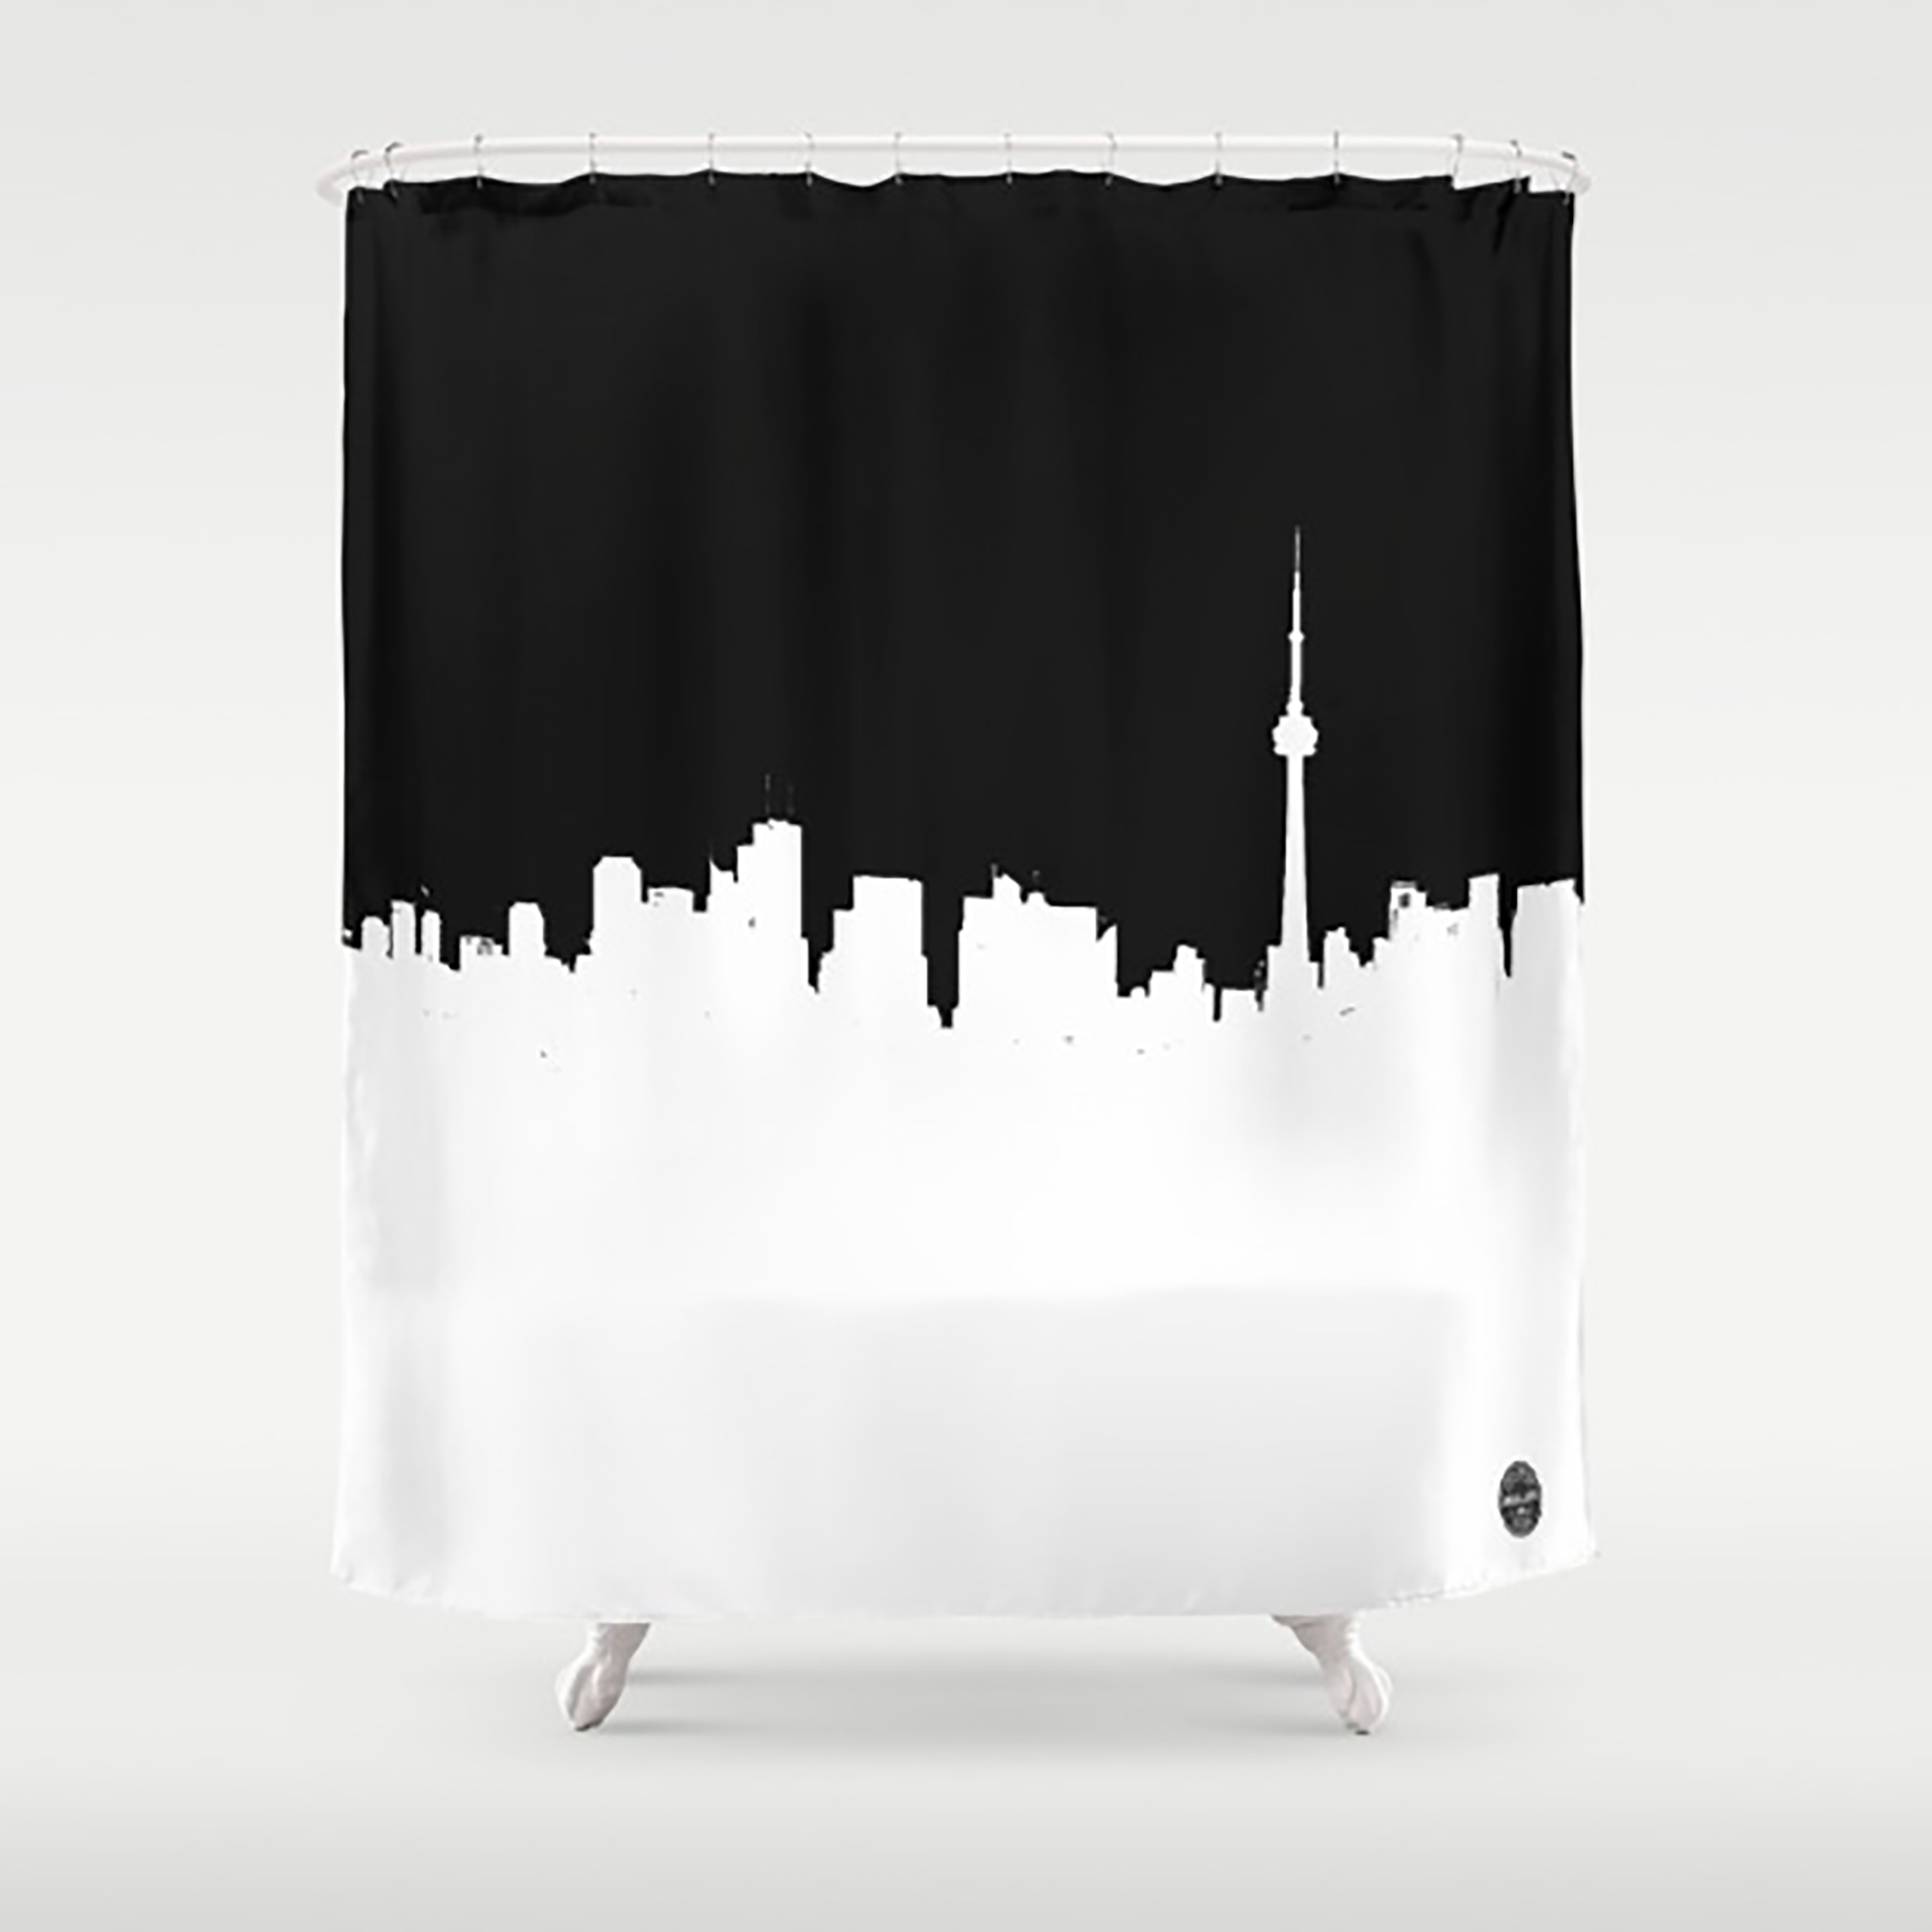 toronto-the-6ix-9yi-shower-curtains 5.jpg